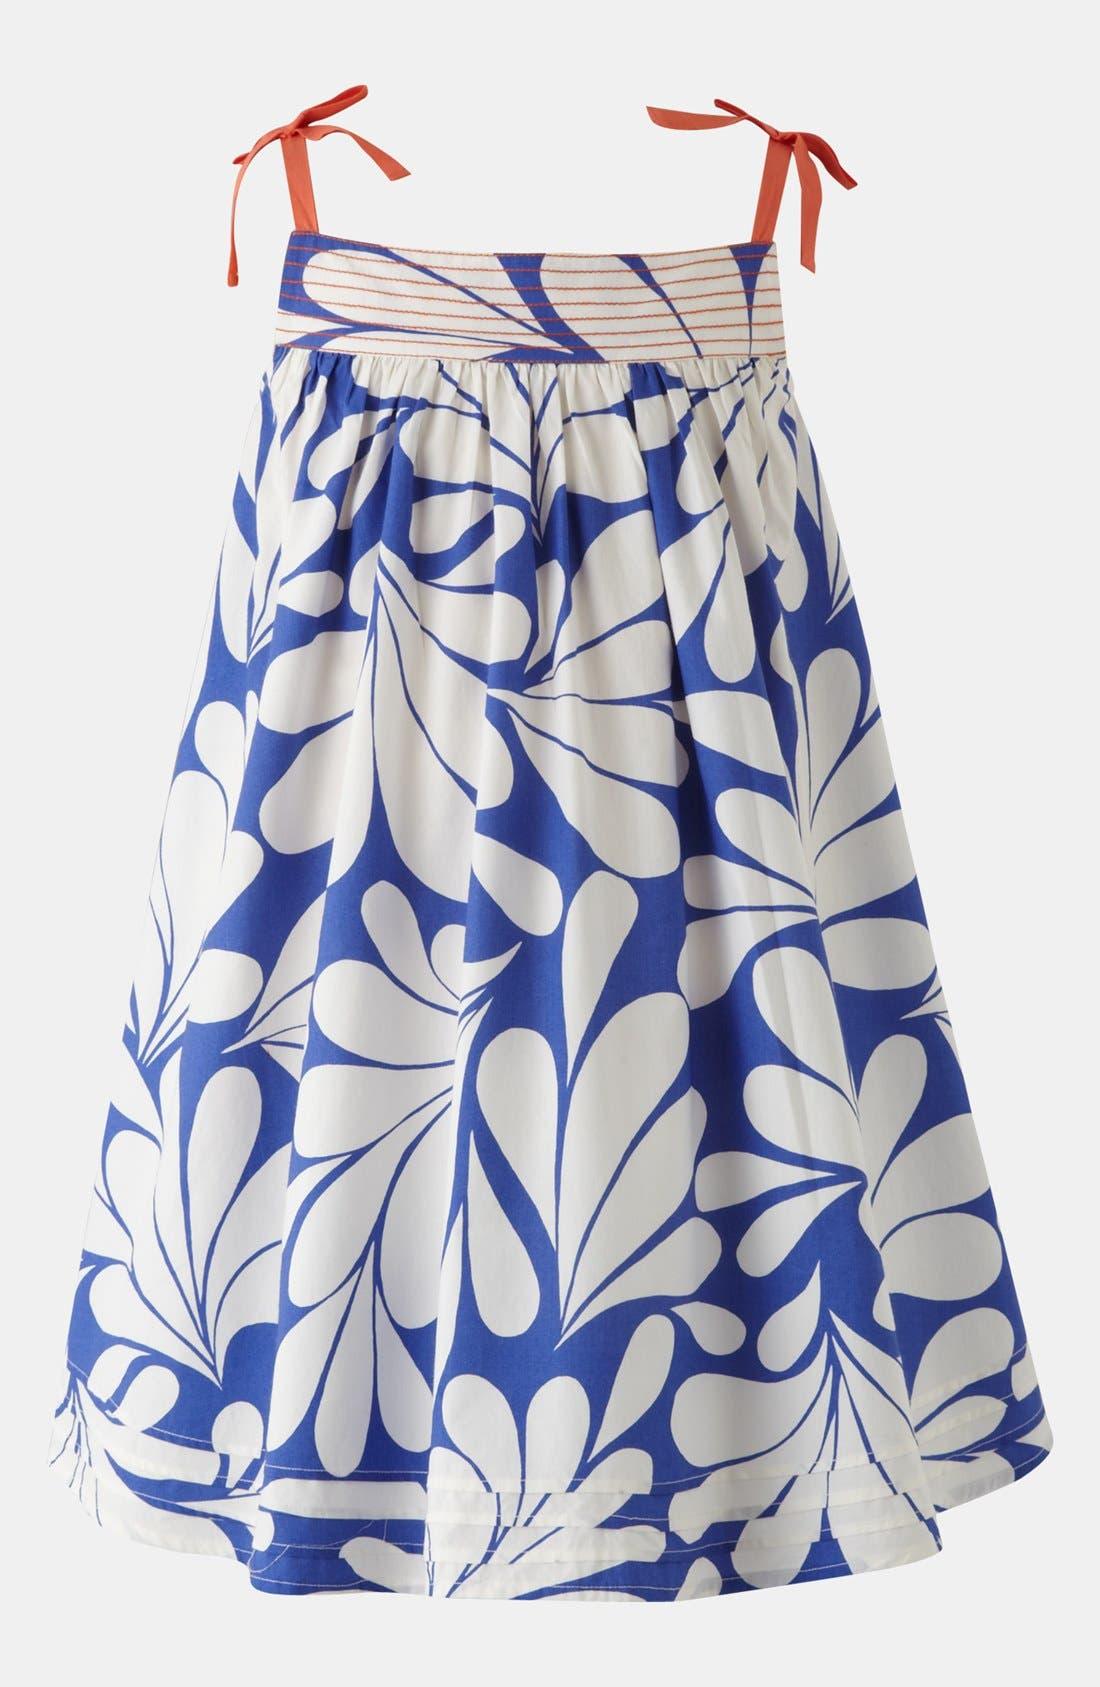 Alternate Image 1 Selected - Mini Boden Print Holiday Dress (Toddler)